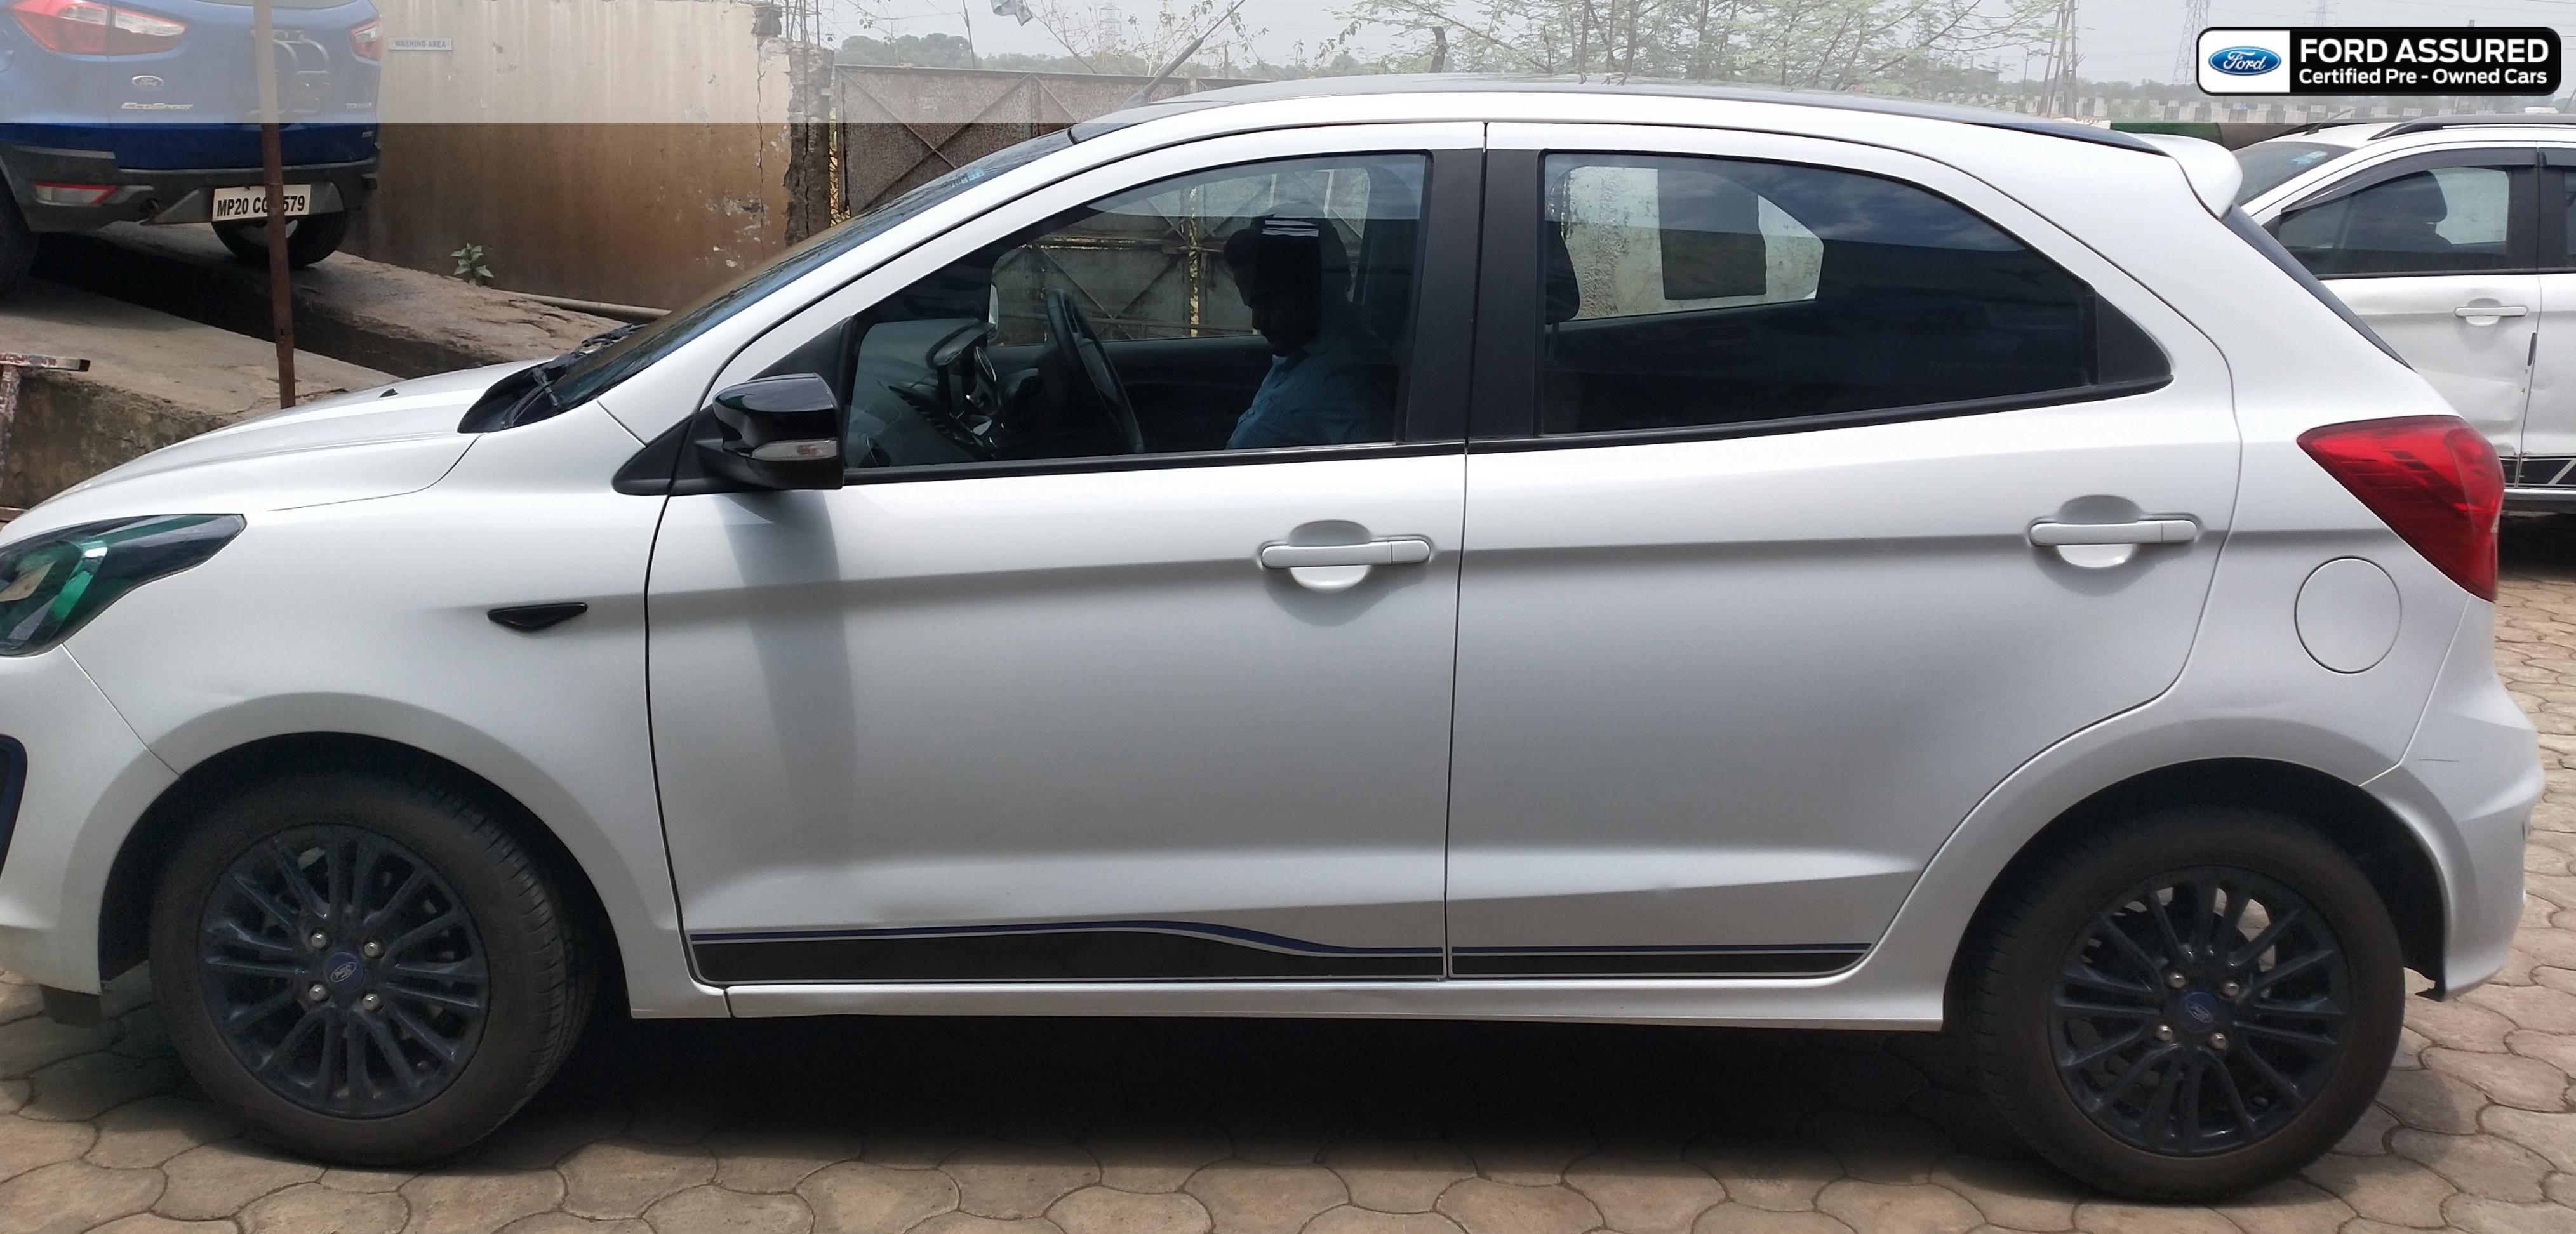 Ford Figo Titanium Blu BSIV